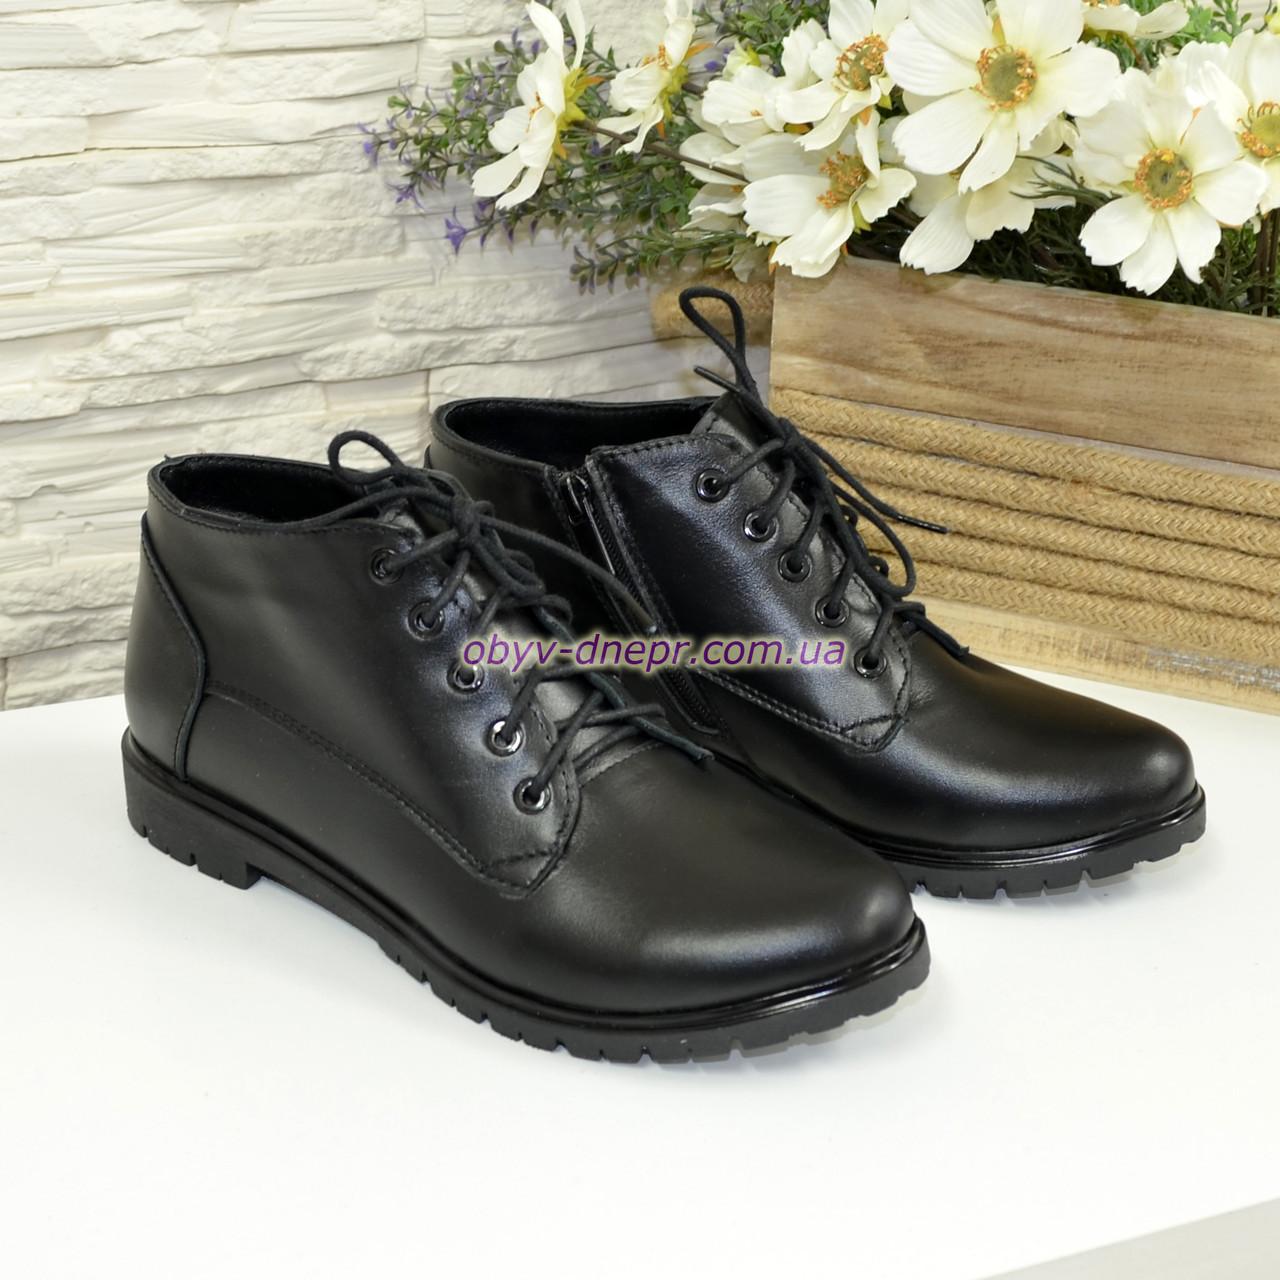 Ботинки женские кожаные на шнурках